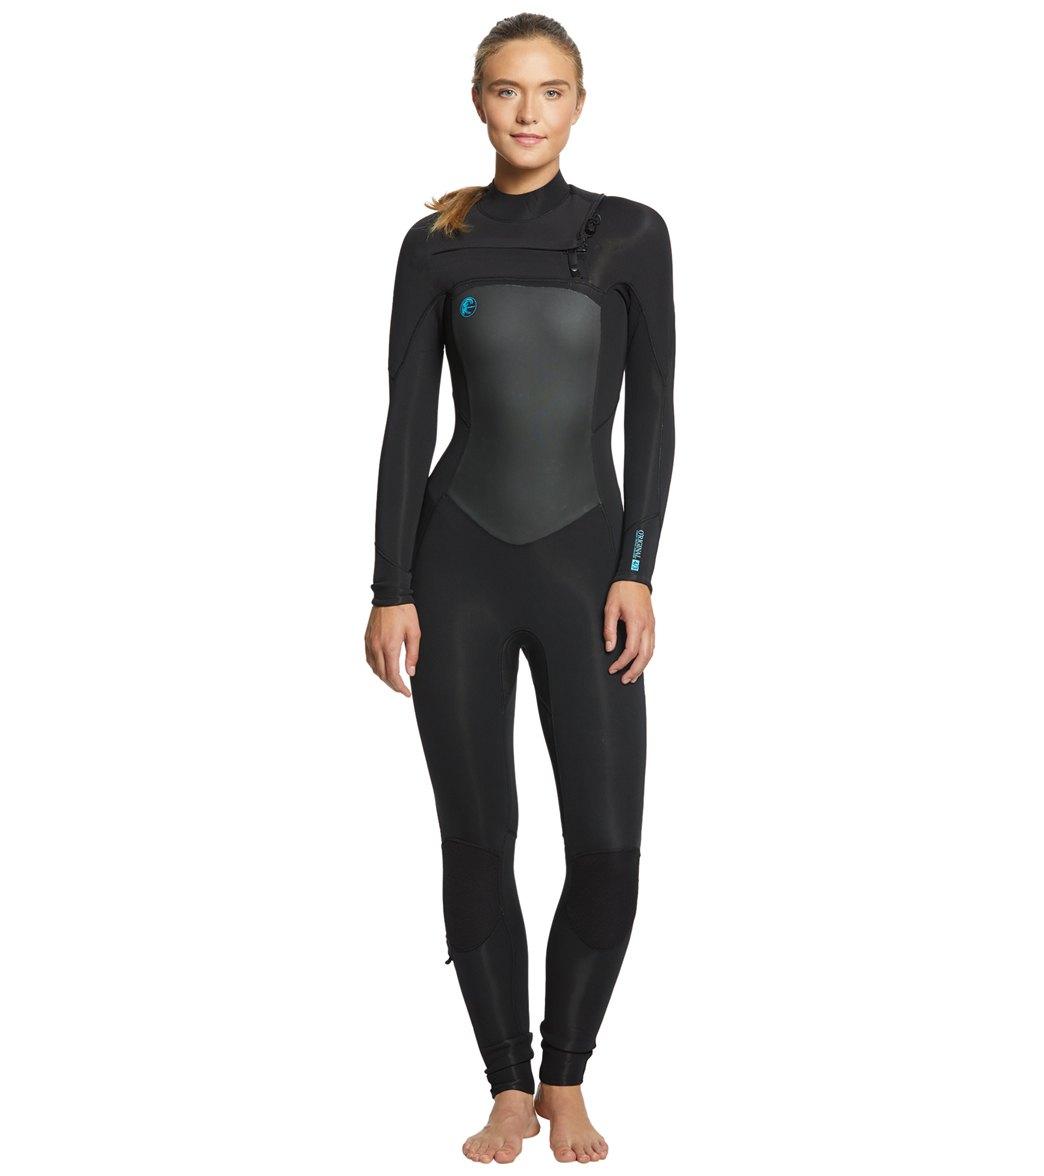 O Neill Women s Original 4 3 Front Zip Wetsuit . 93336e8bc